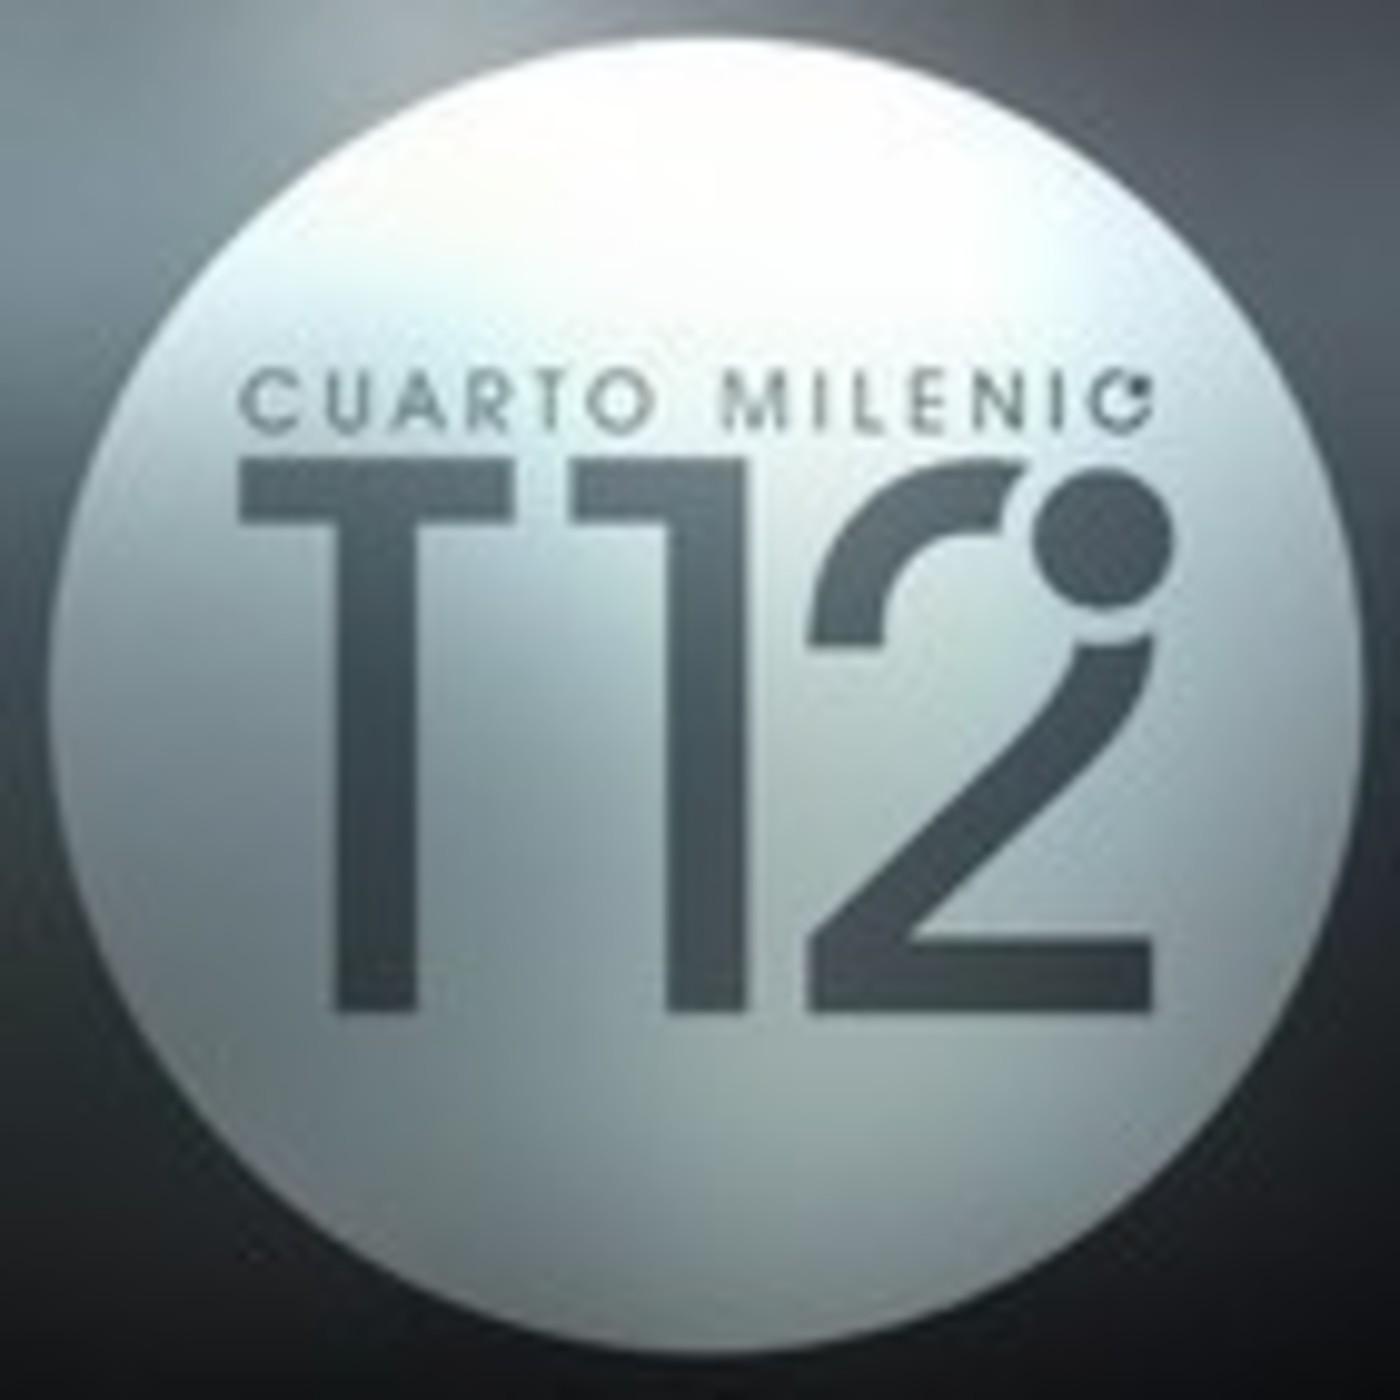 Cuarto milenio (9/7/2017) 12x44: Debate Cambio Climático • Complot ...